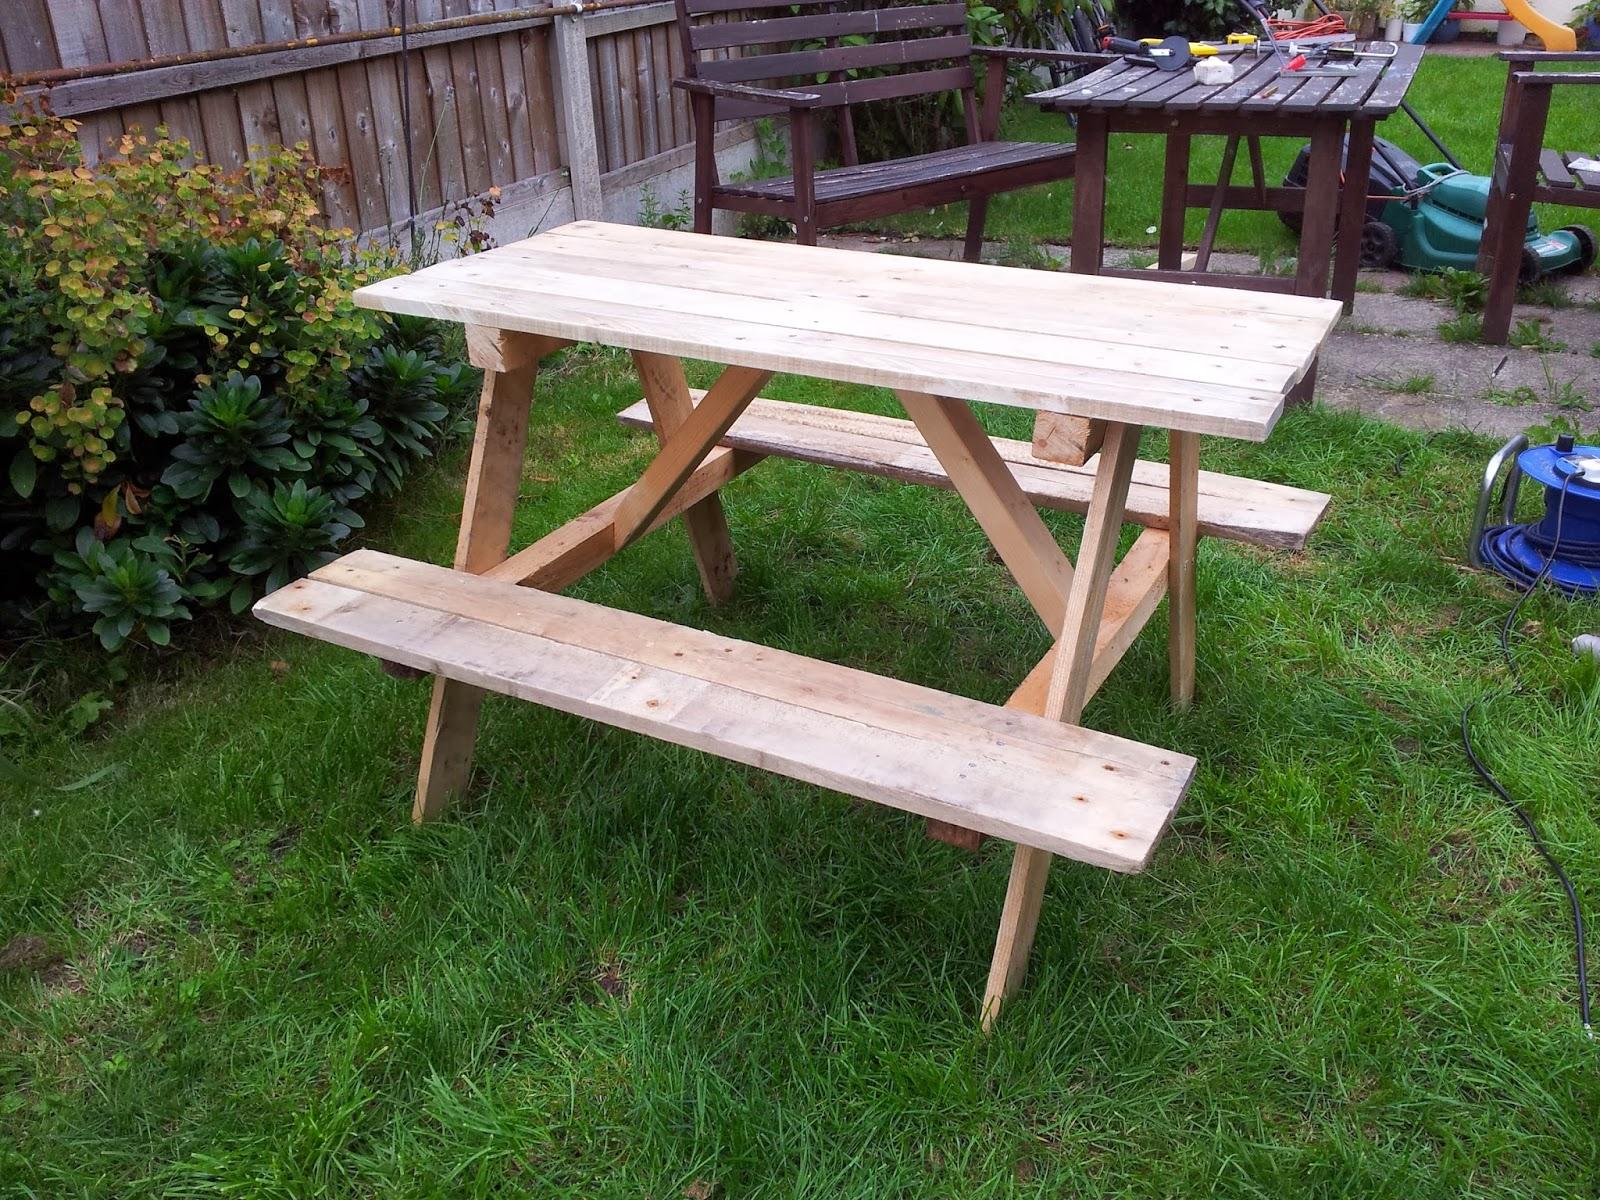 Making stuff: Pallet Picnic Table